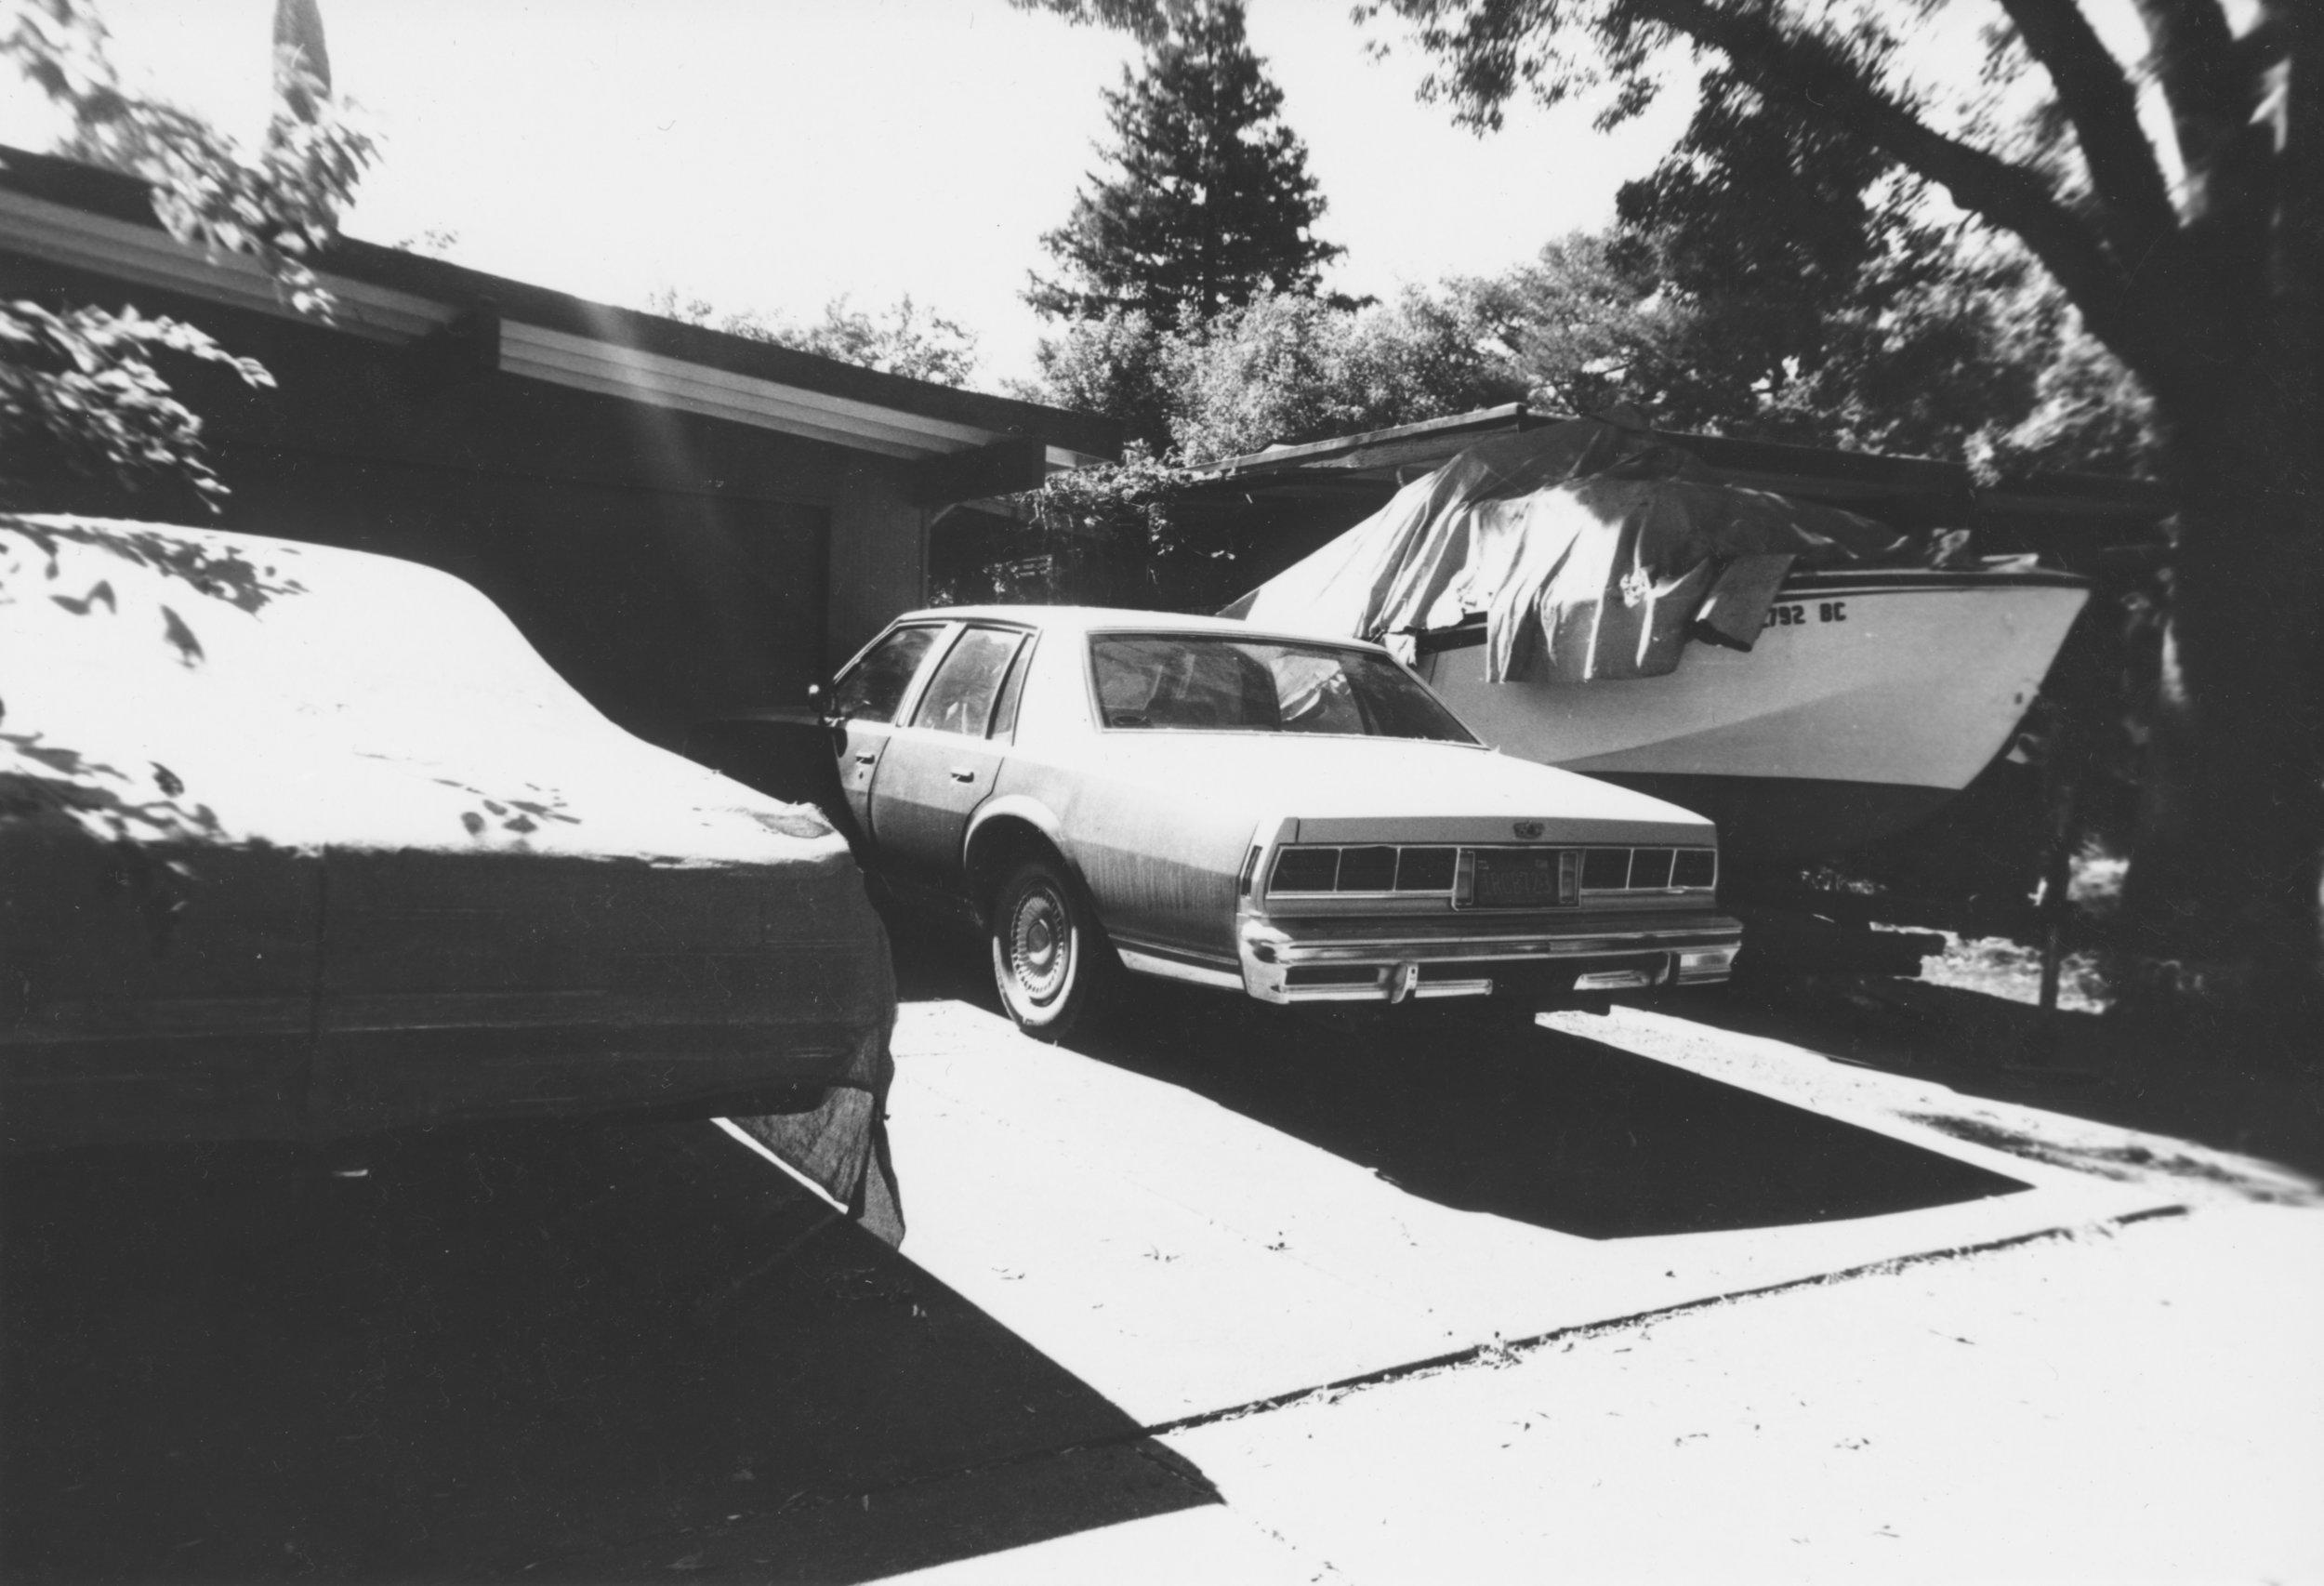 cars-driveway.jpeg